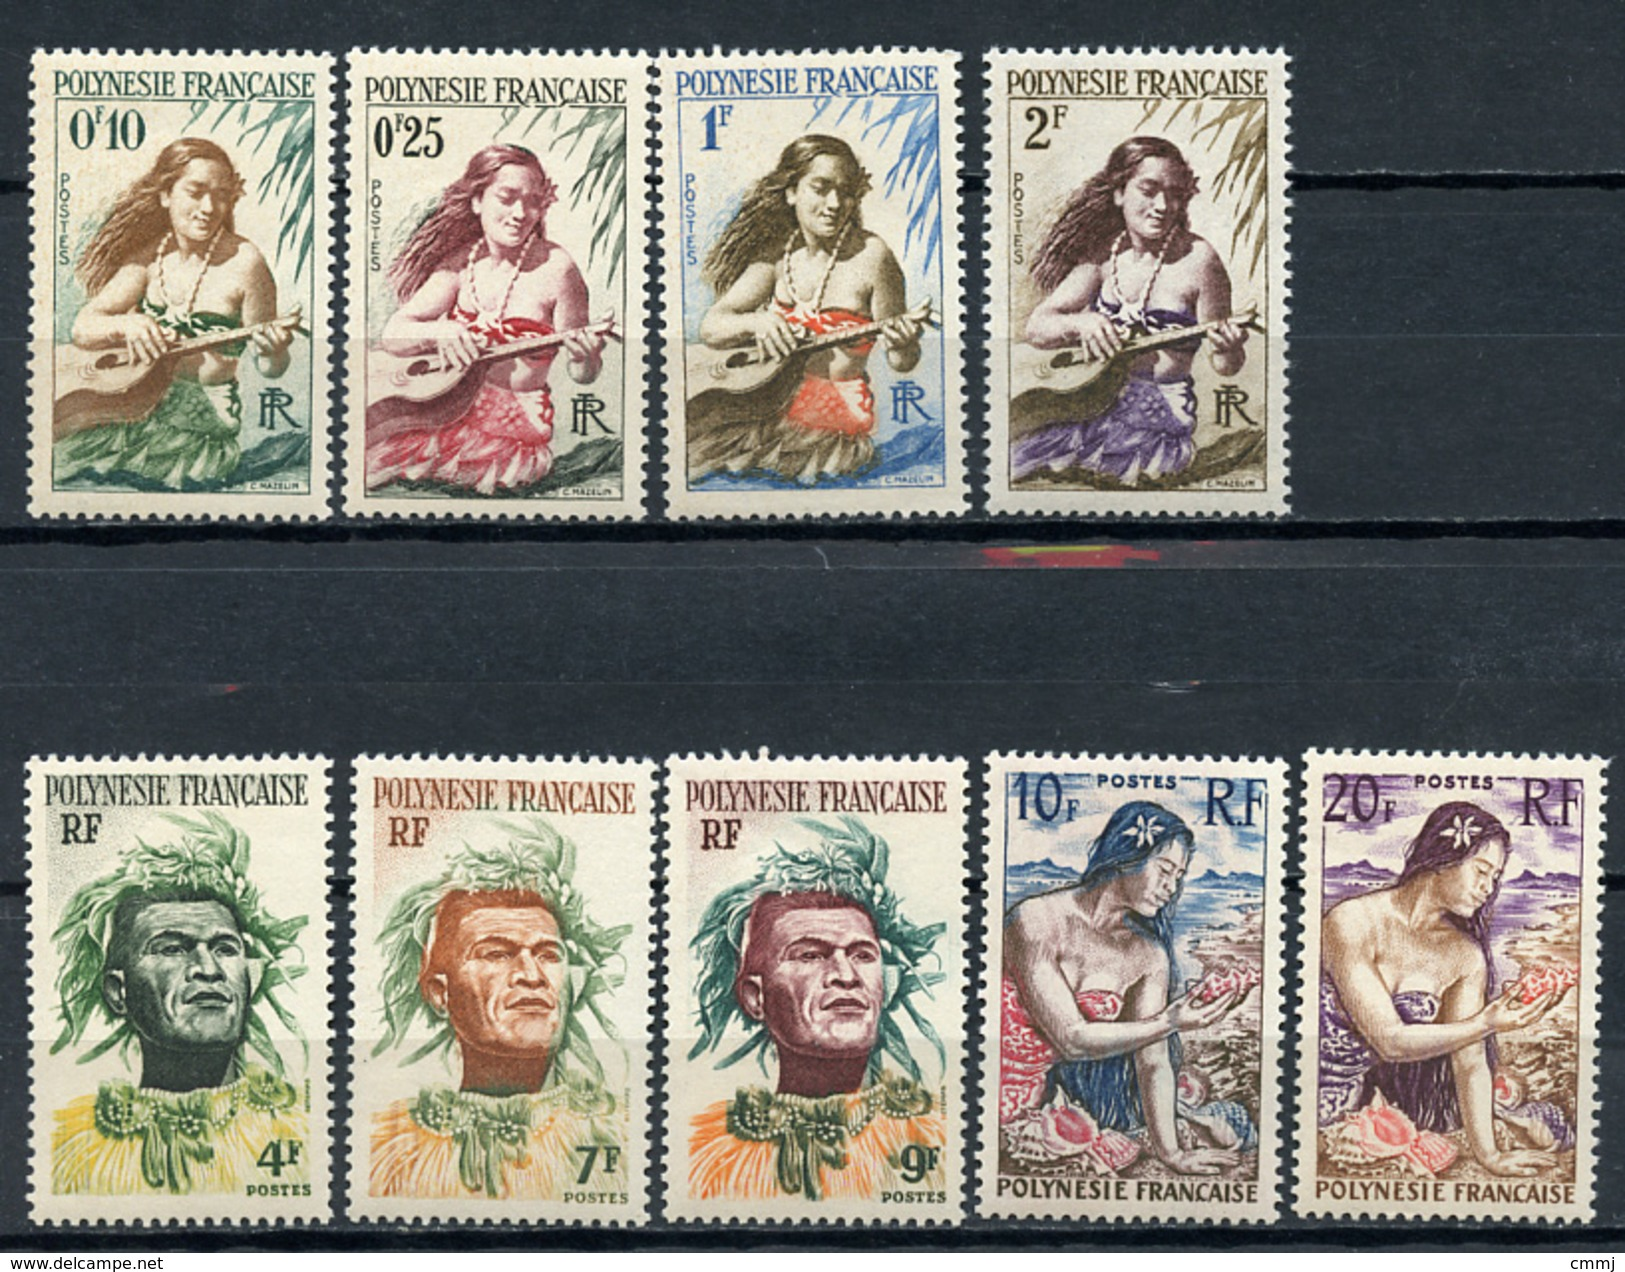 1958 -  POLINESIA FRANCESE - Mi. Nr. 1/9 -  NH - (SAND1176.12) - Polinesia Francese